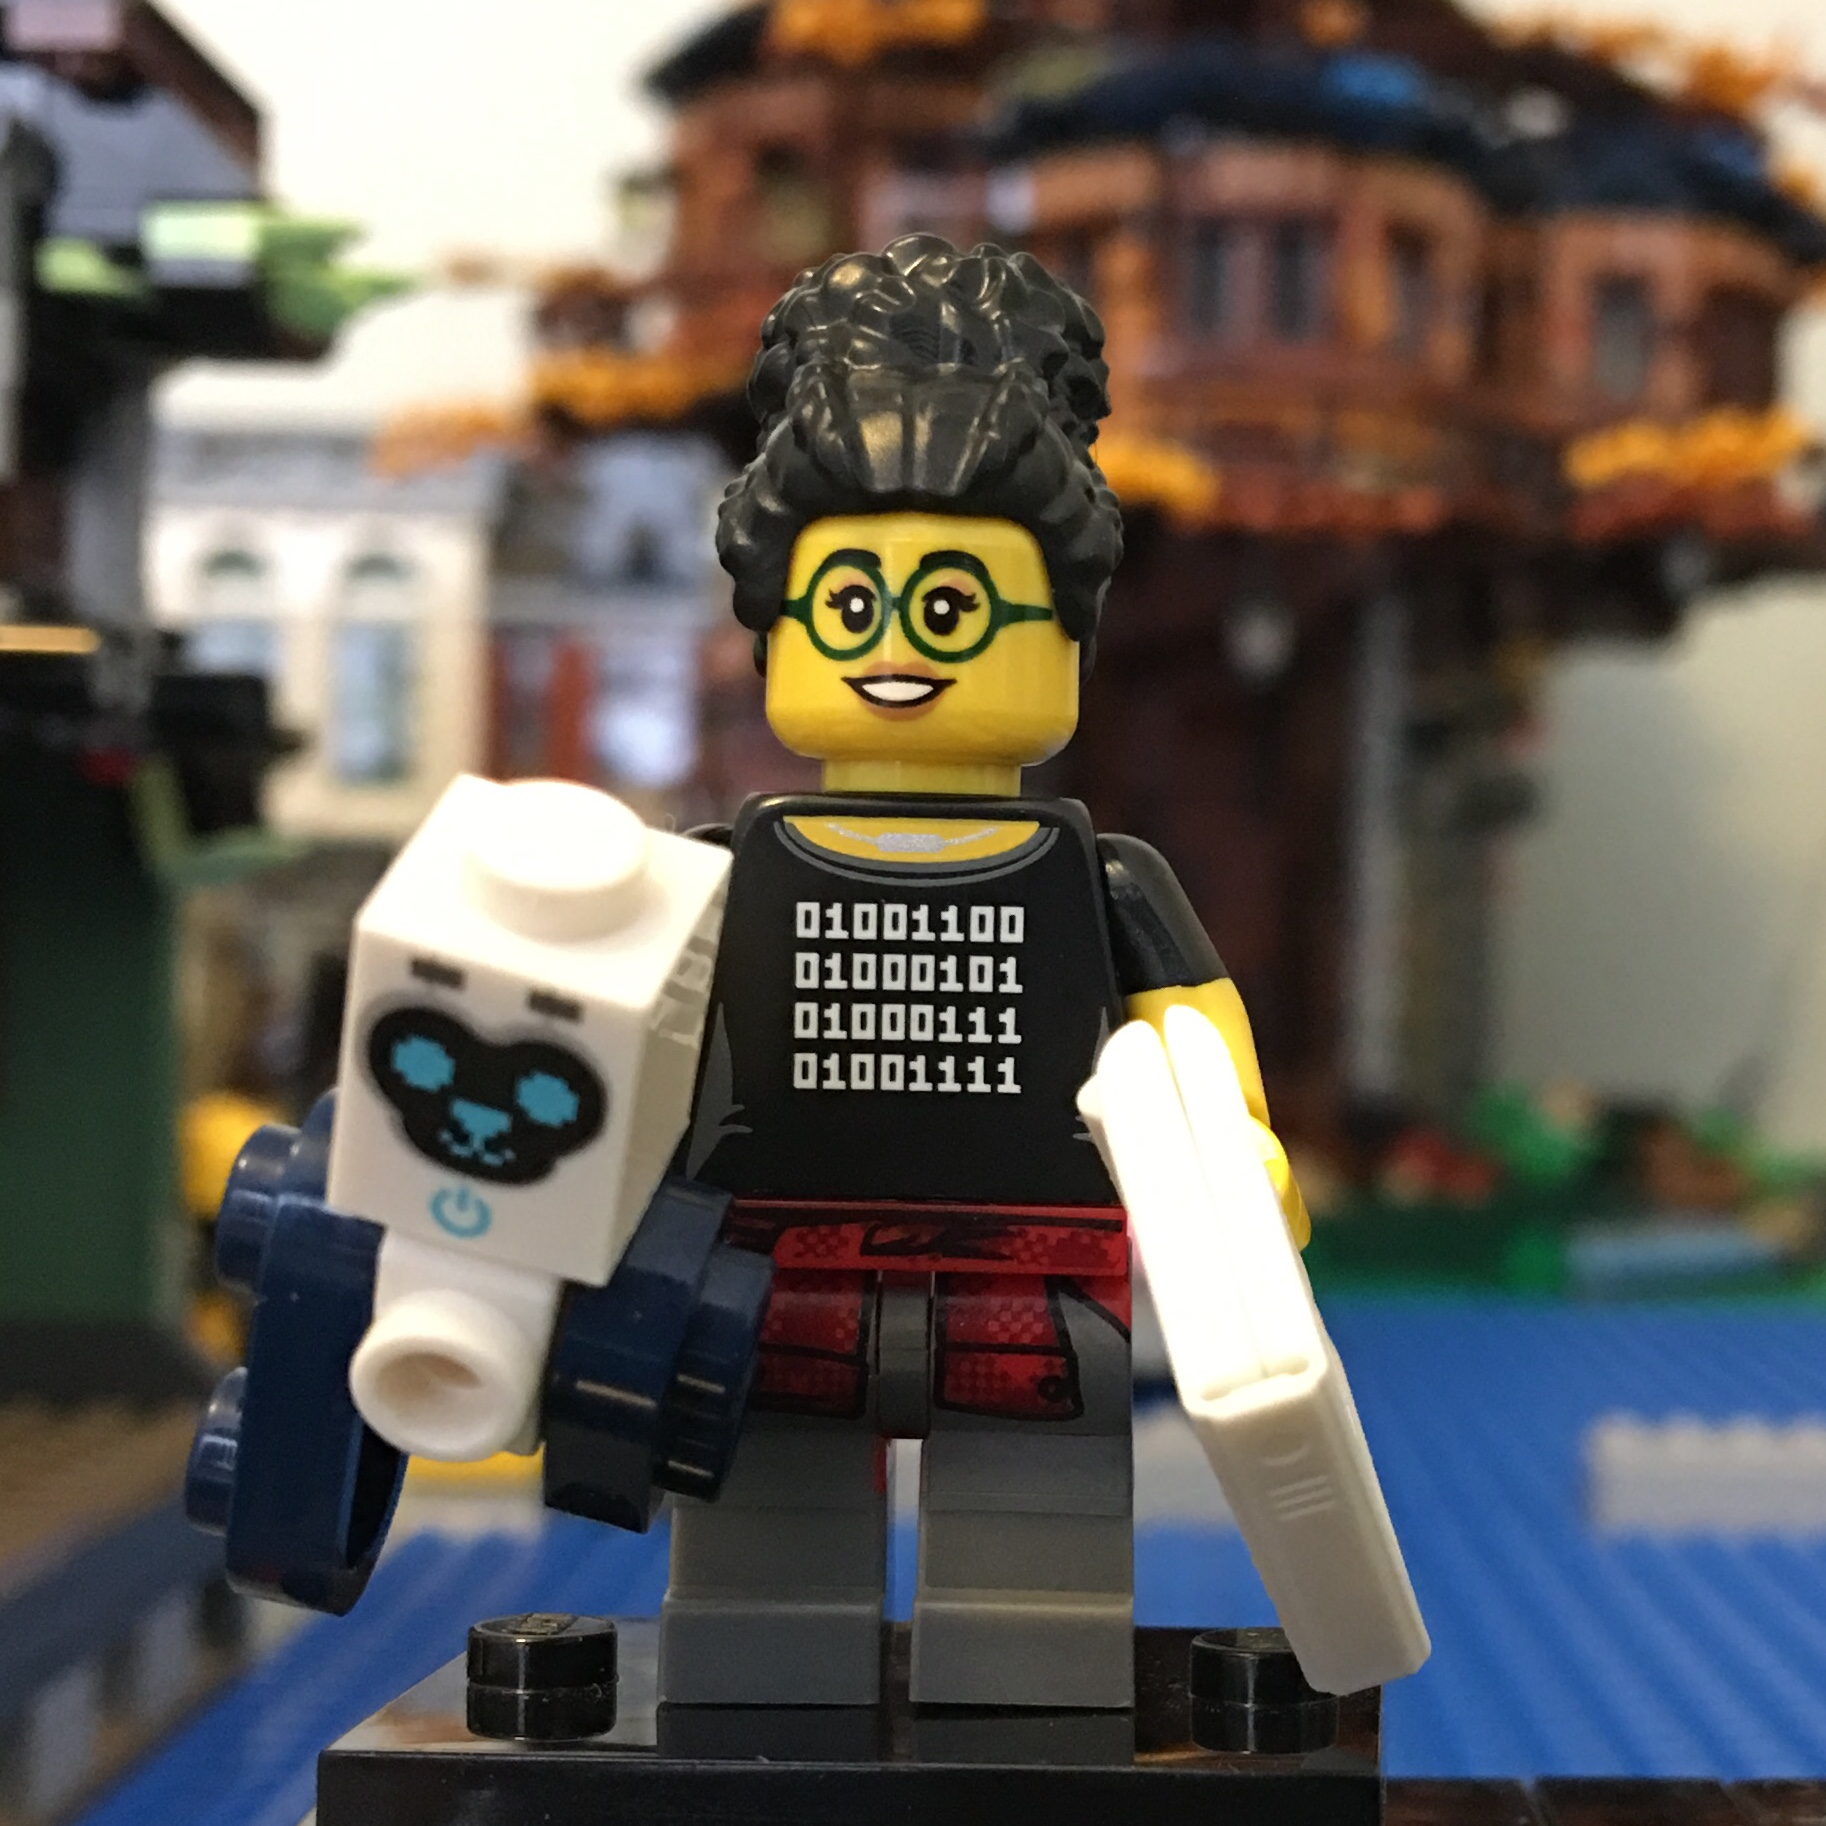 LEGO Programmer Coder Girl Minifigure Series 19 71025 New Genuine Laptop